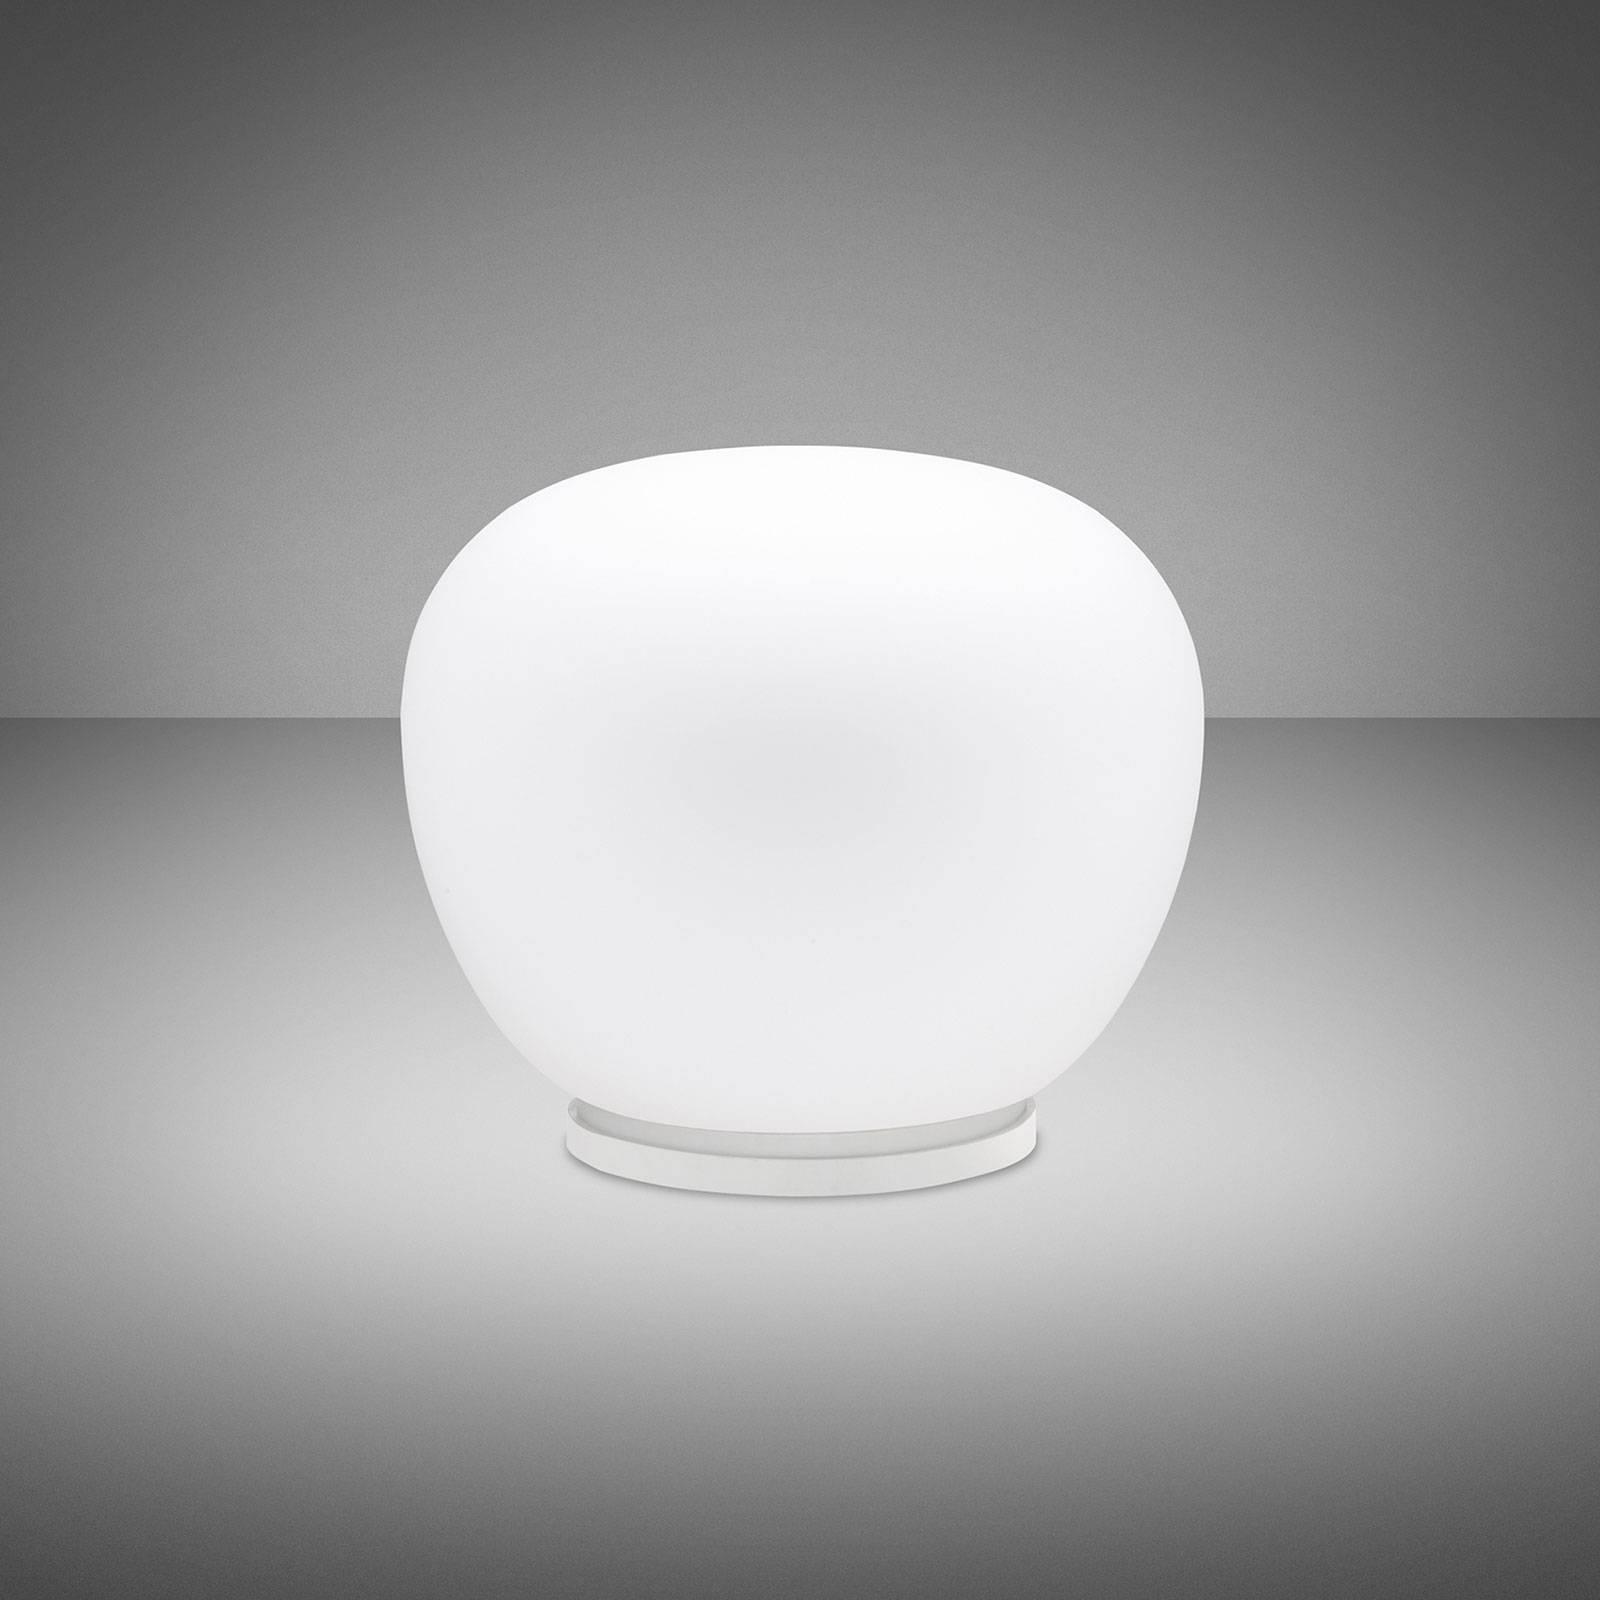 Fabbian Lumi Mochi tafellamp, liggend, Ø 30 cm